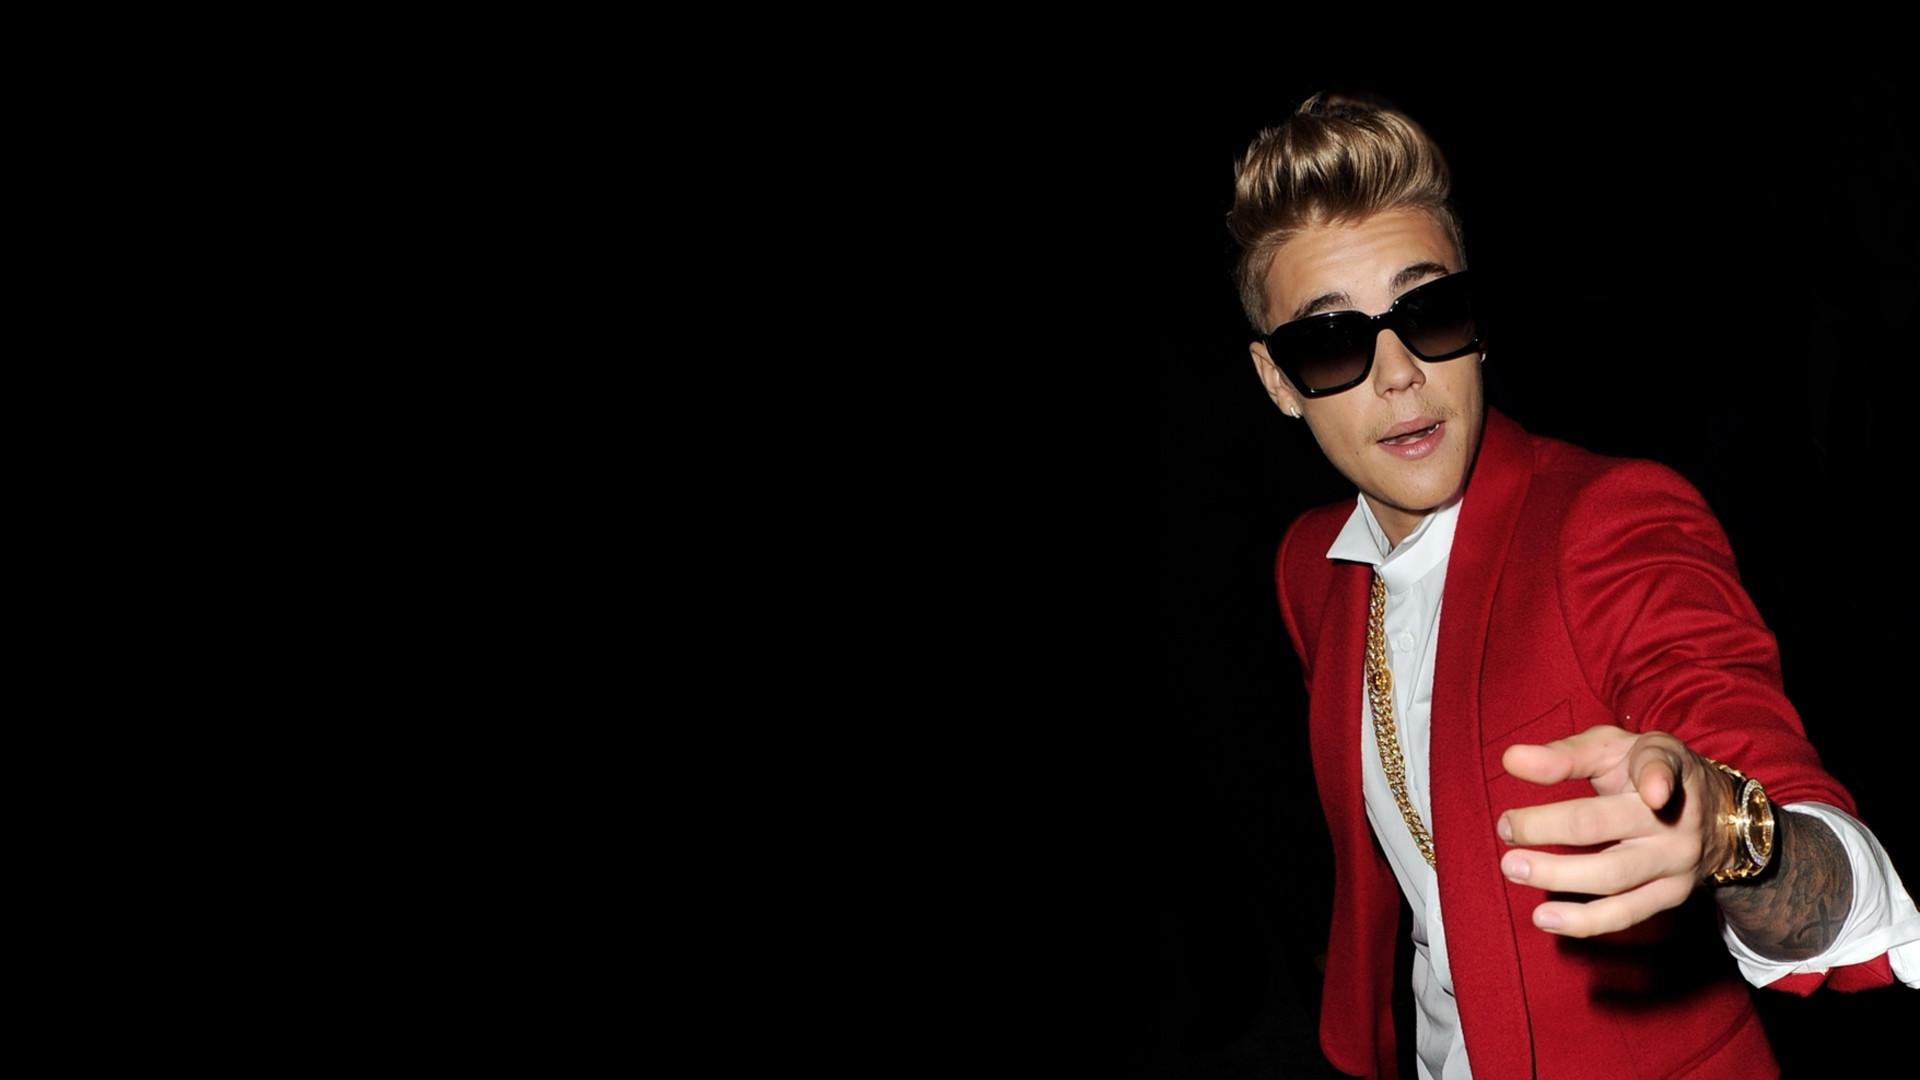 Justin Bieber Photo Wallpaper Hd In Men Wallpapers Hd Fpdjair